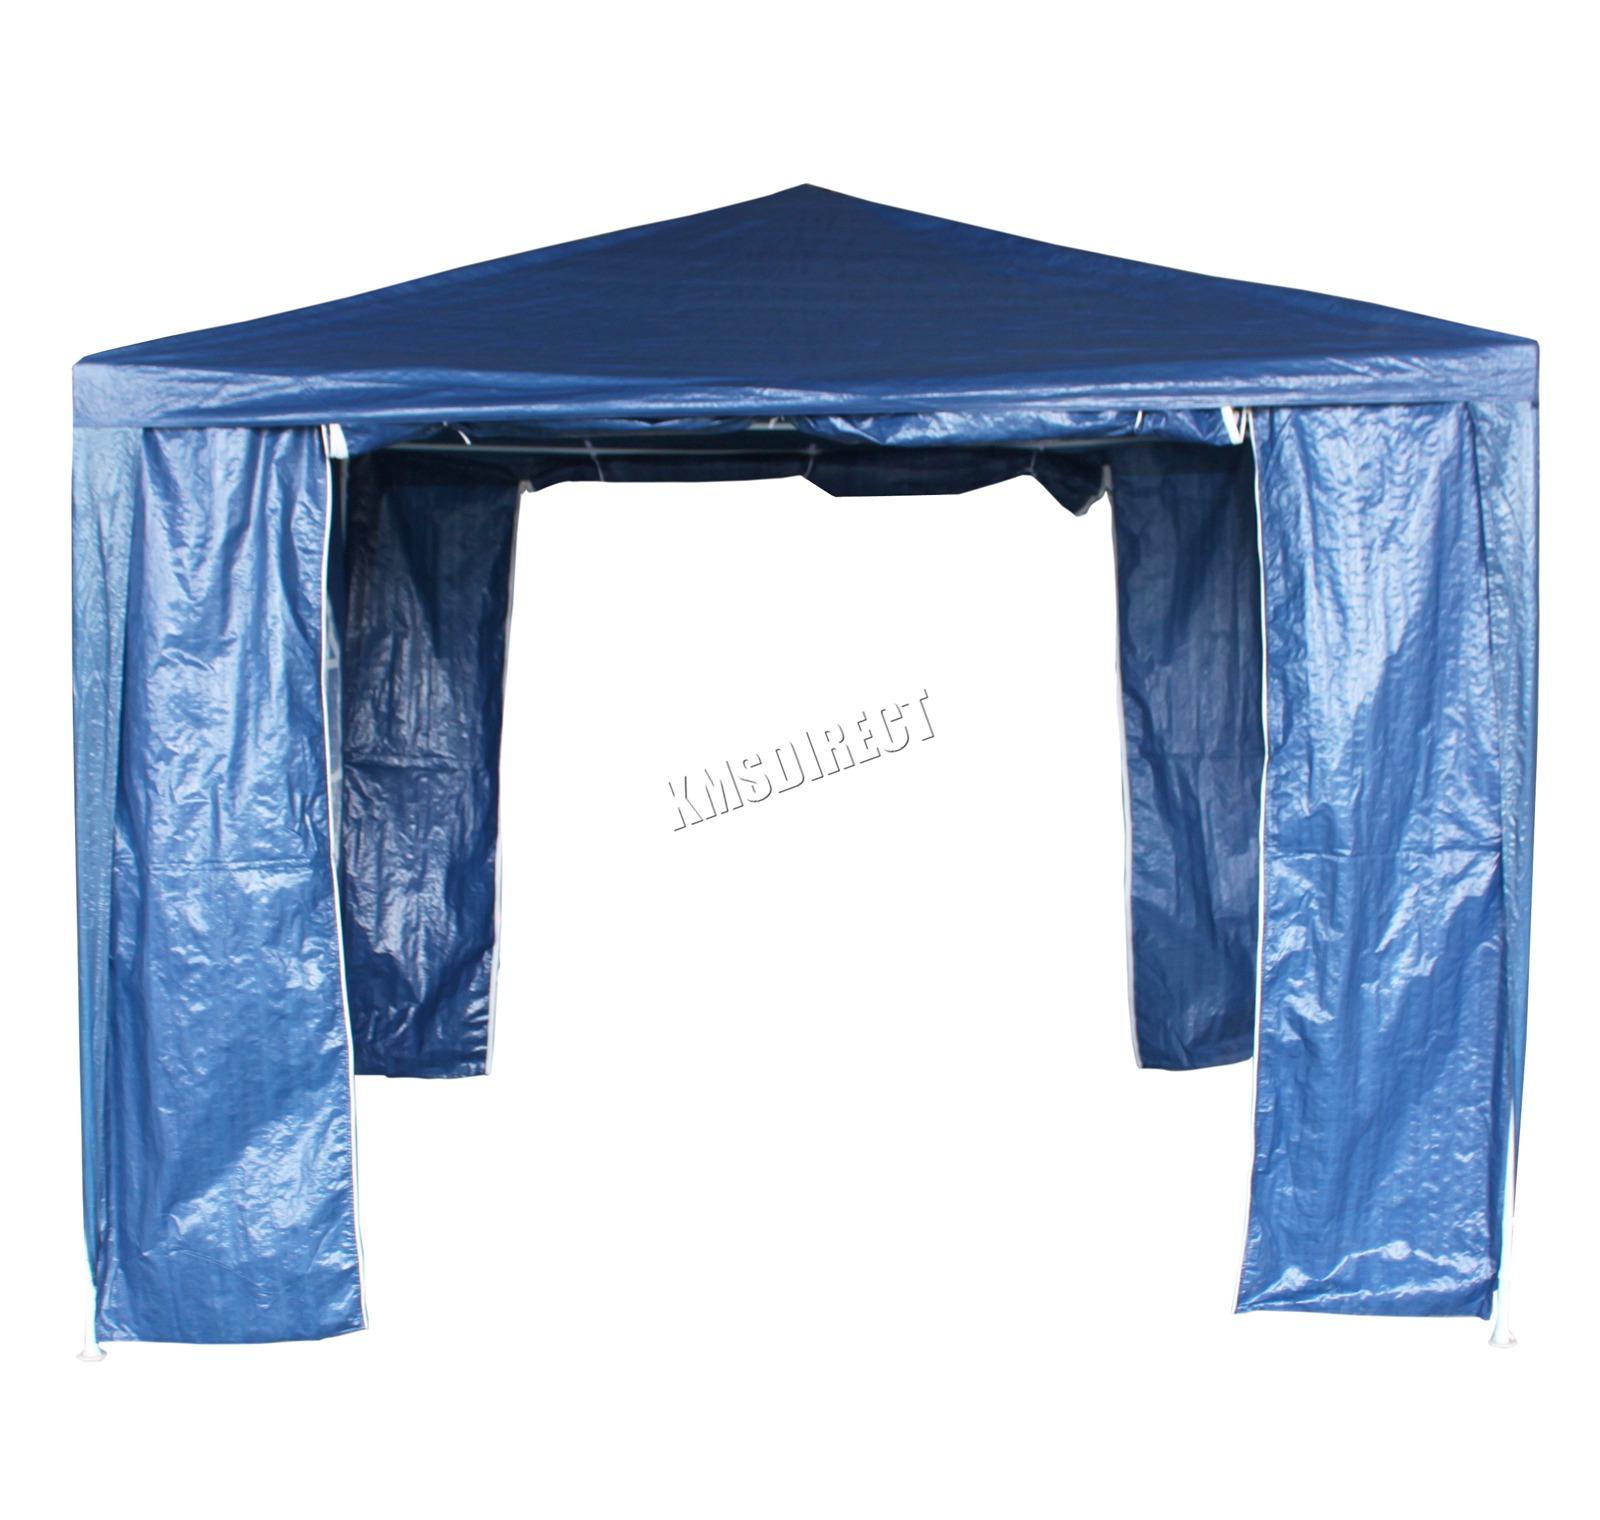 New-3-x-3m-120g-Waterproof-Outdoor-PE-Garden-Gazebo-Marquee-Canopy-Party-Tent Indexbild 21